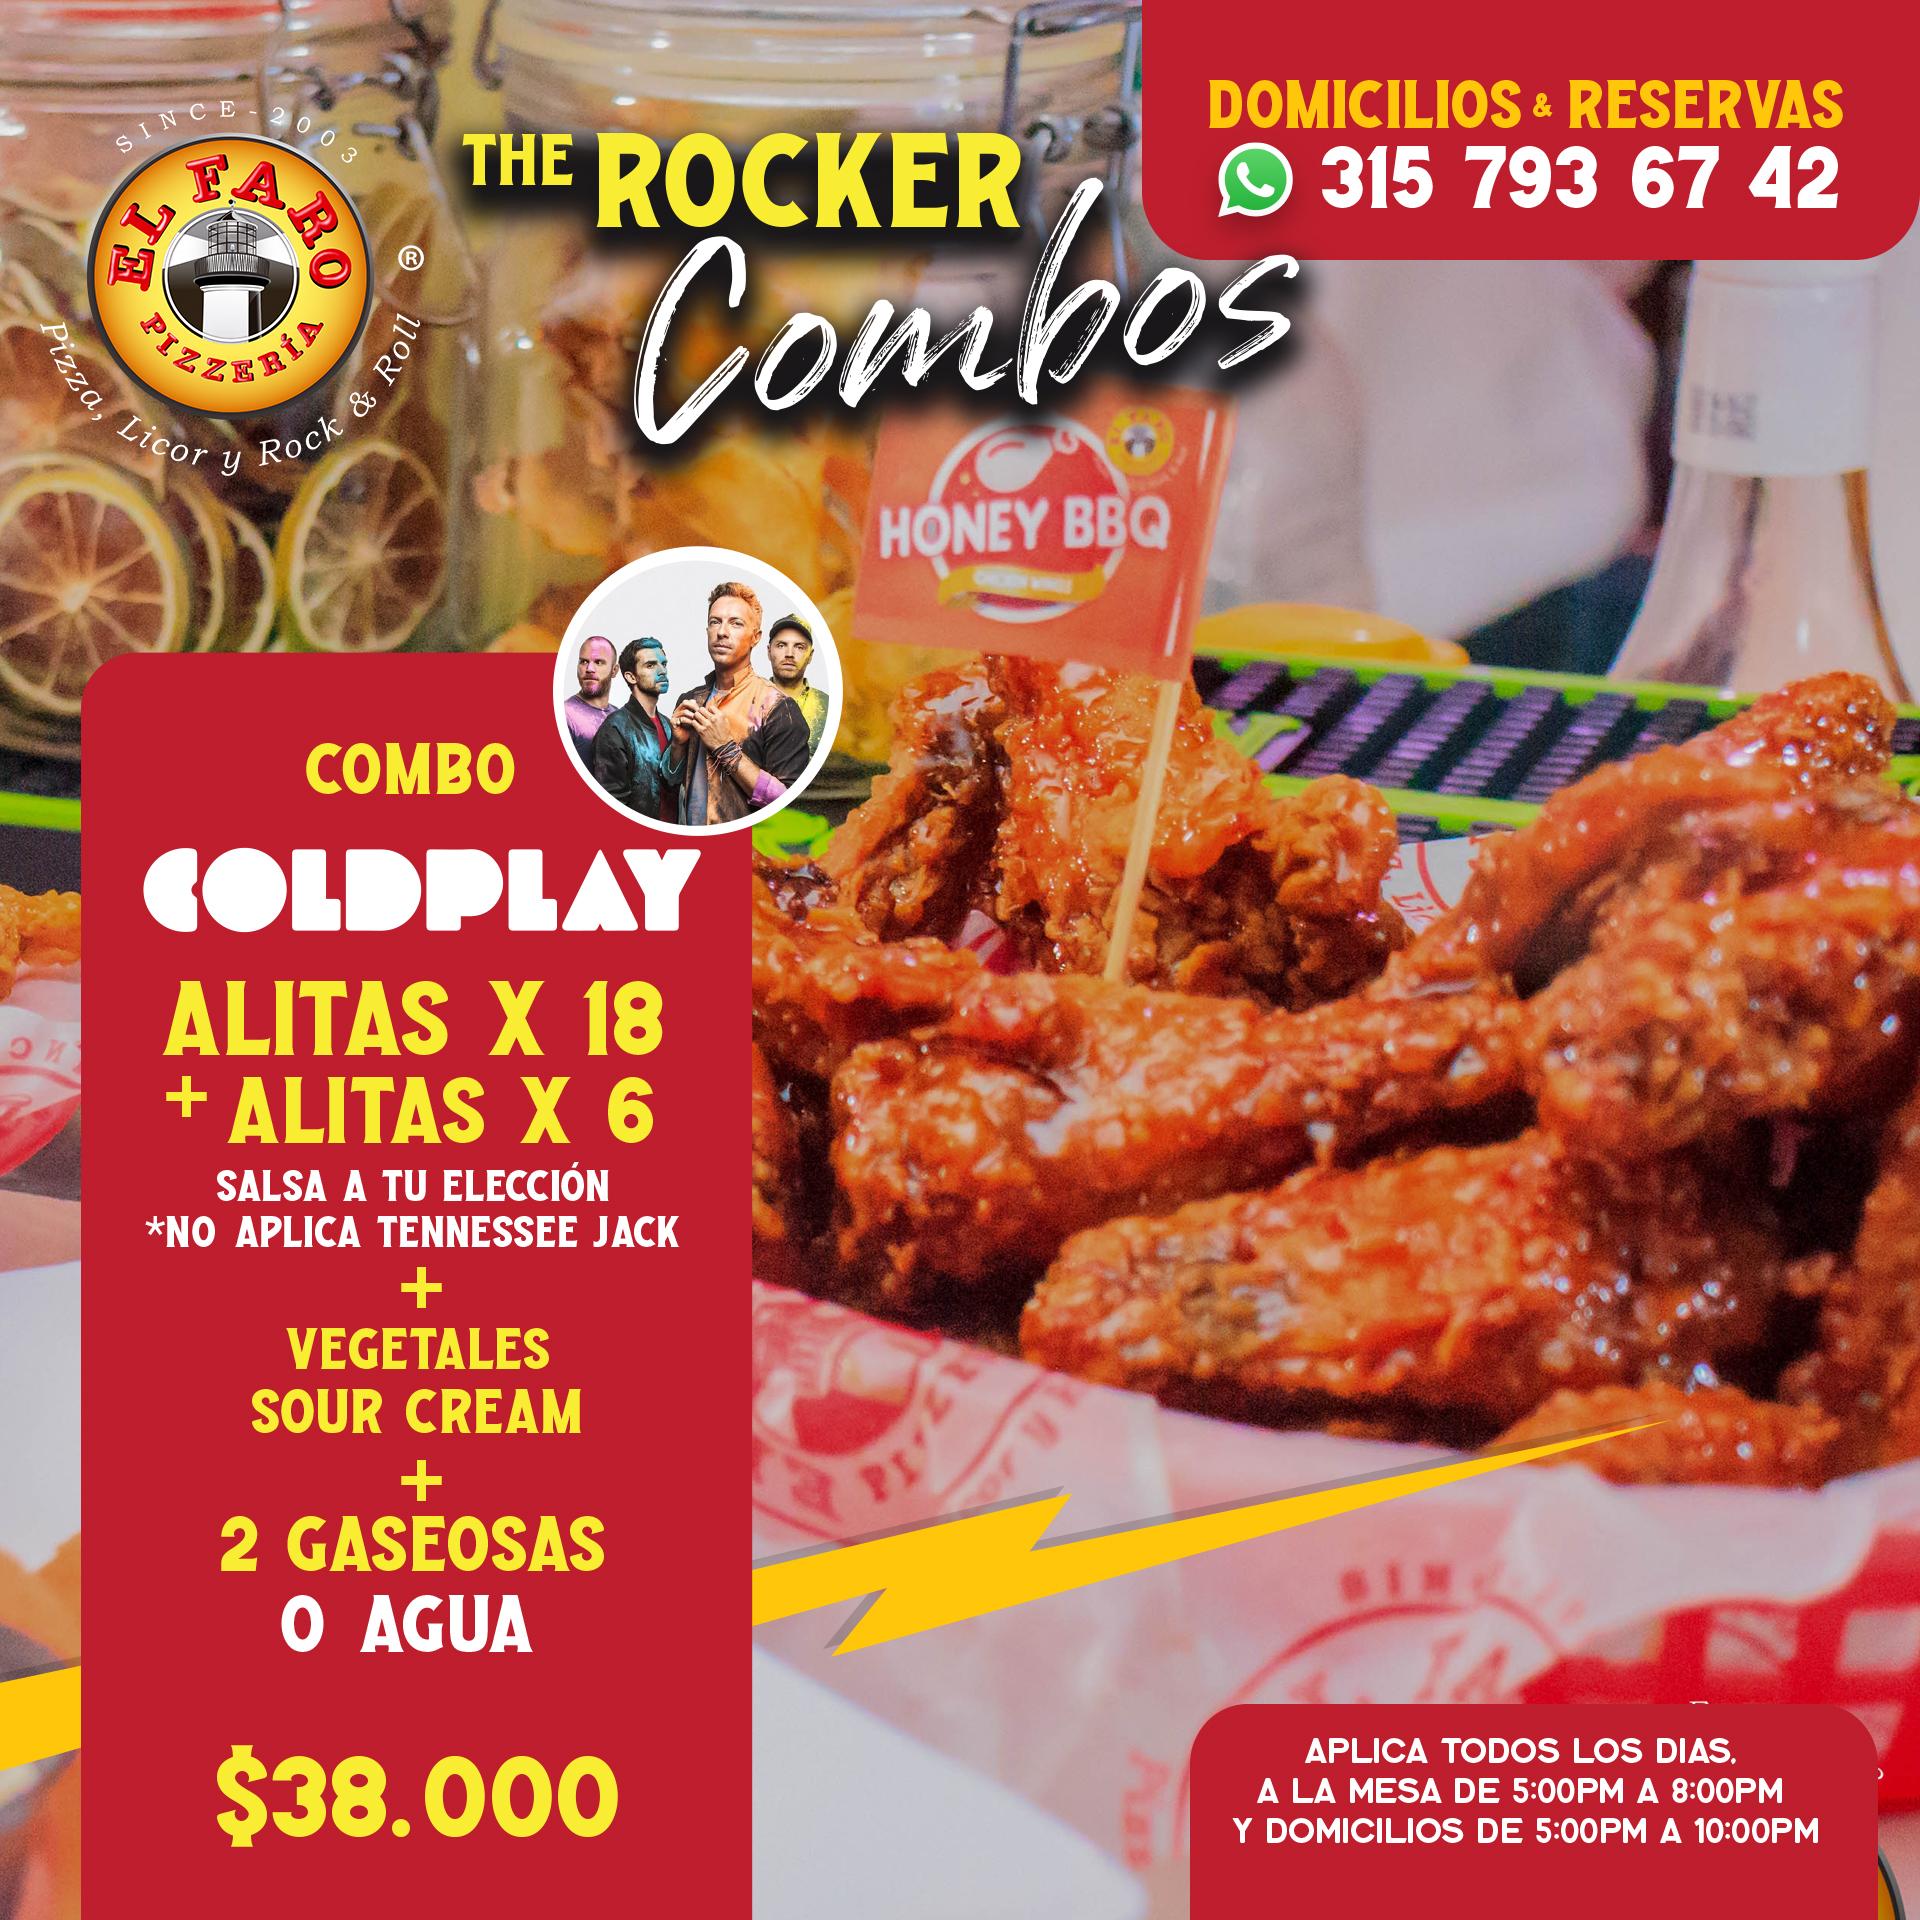 3--ROCKER-COMBO-5---COLDPLAY-SQ